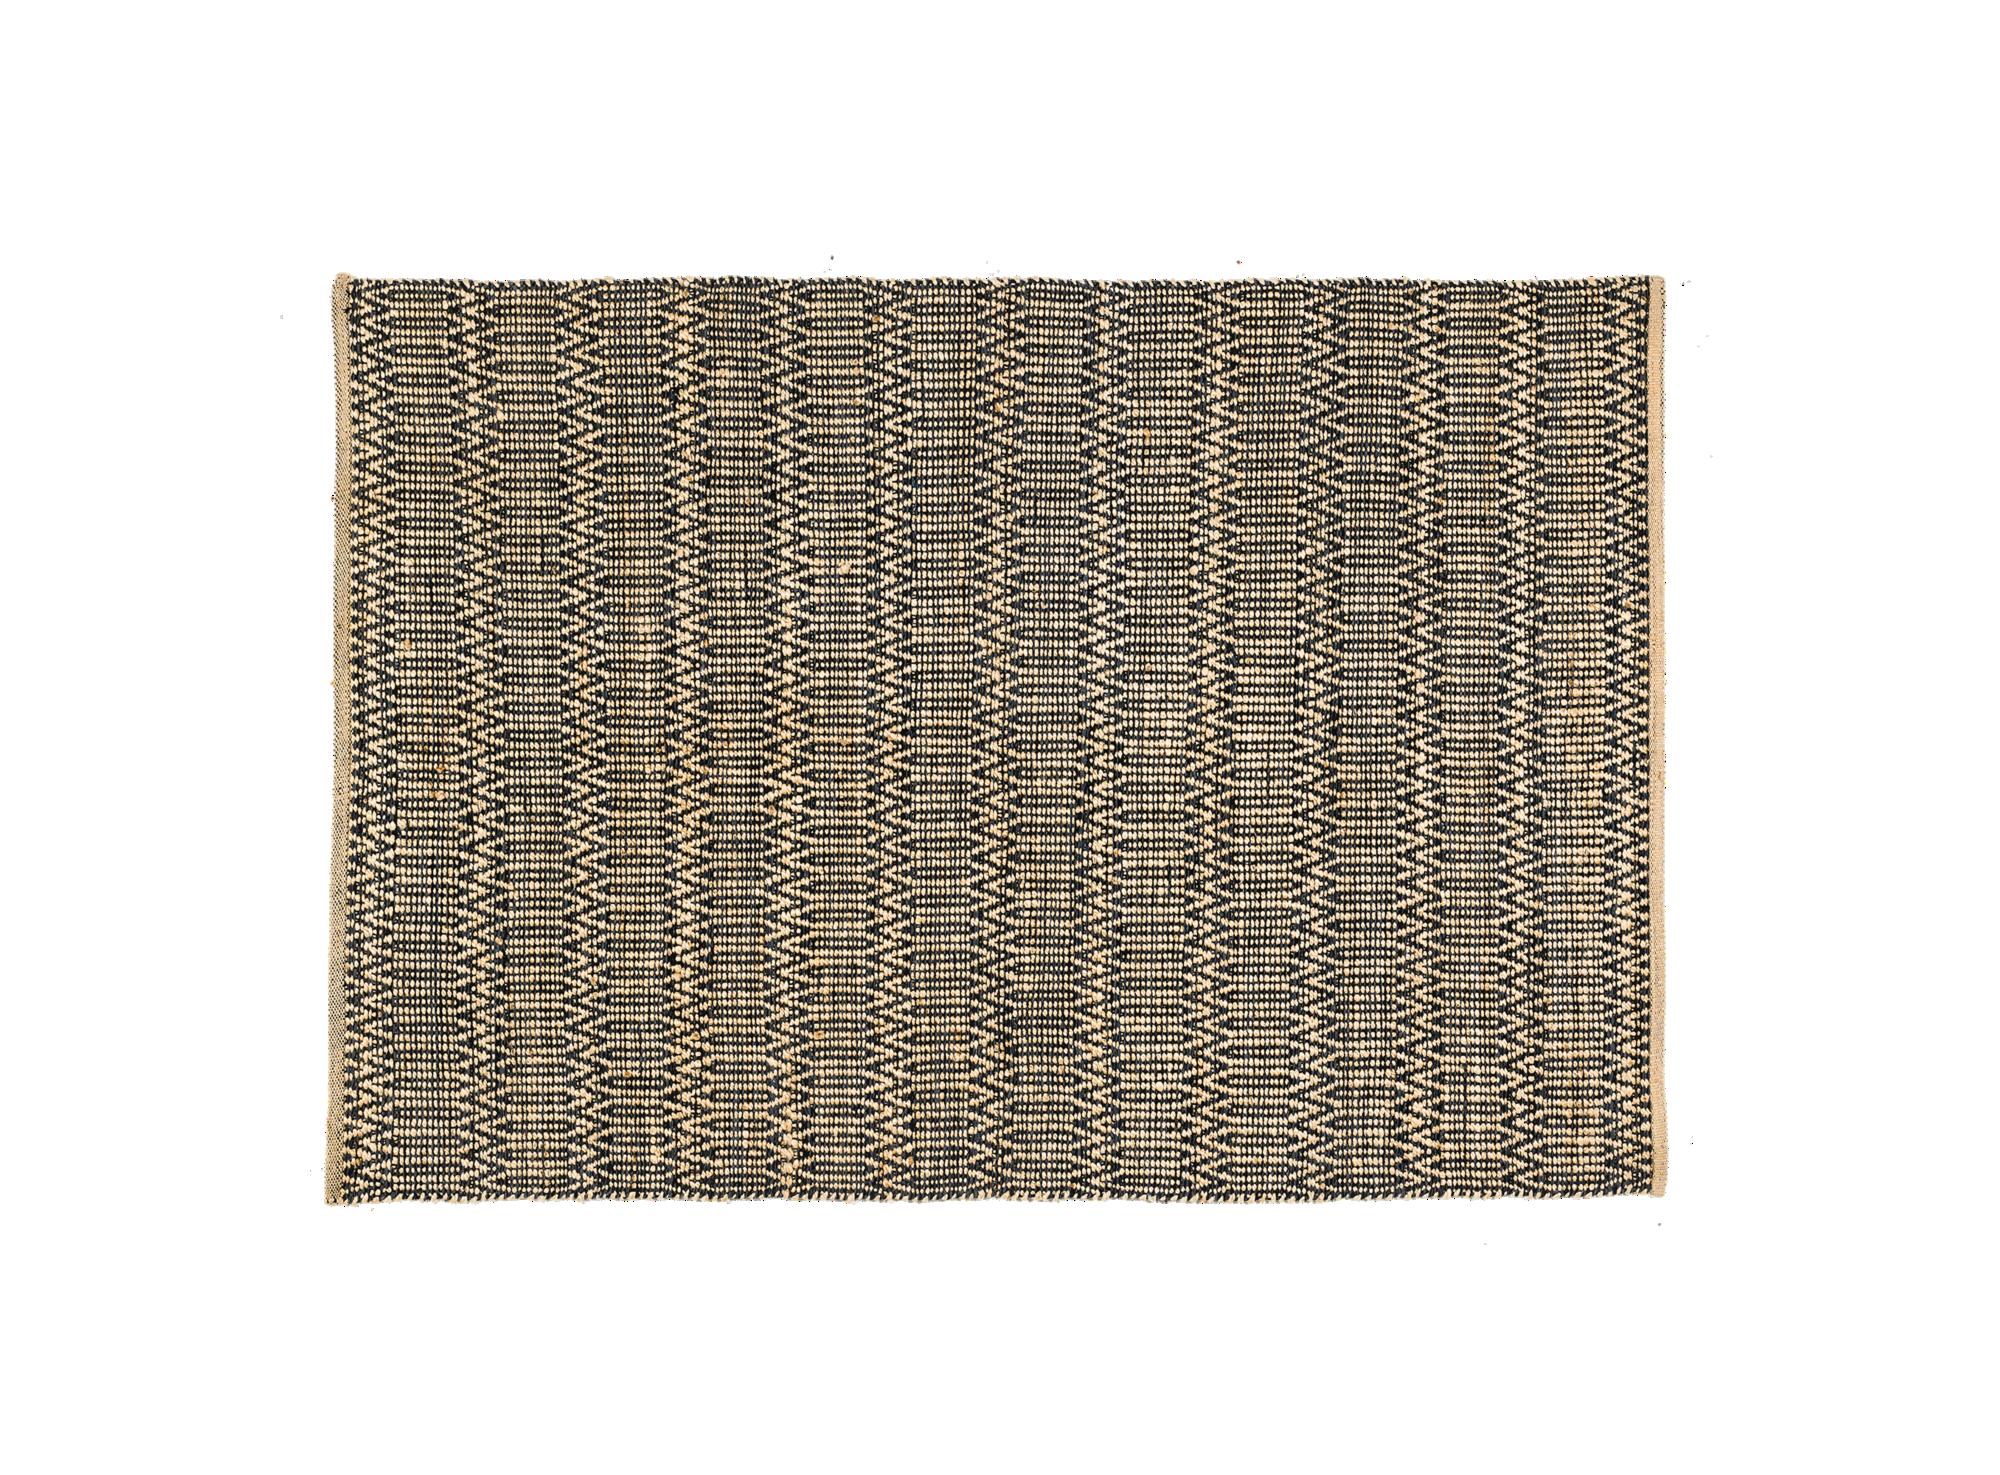 Tapis Jute Coton 160x230 Beige Tapis Chambre Salon Tapis Textile Fly